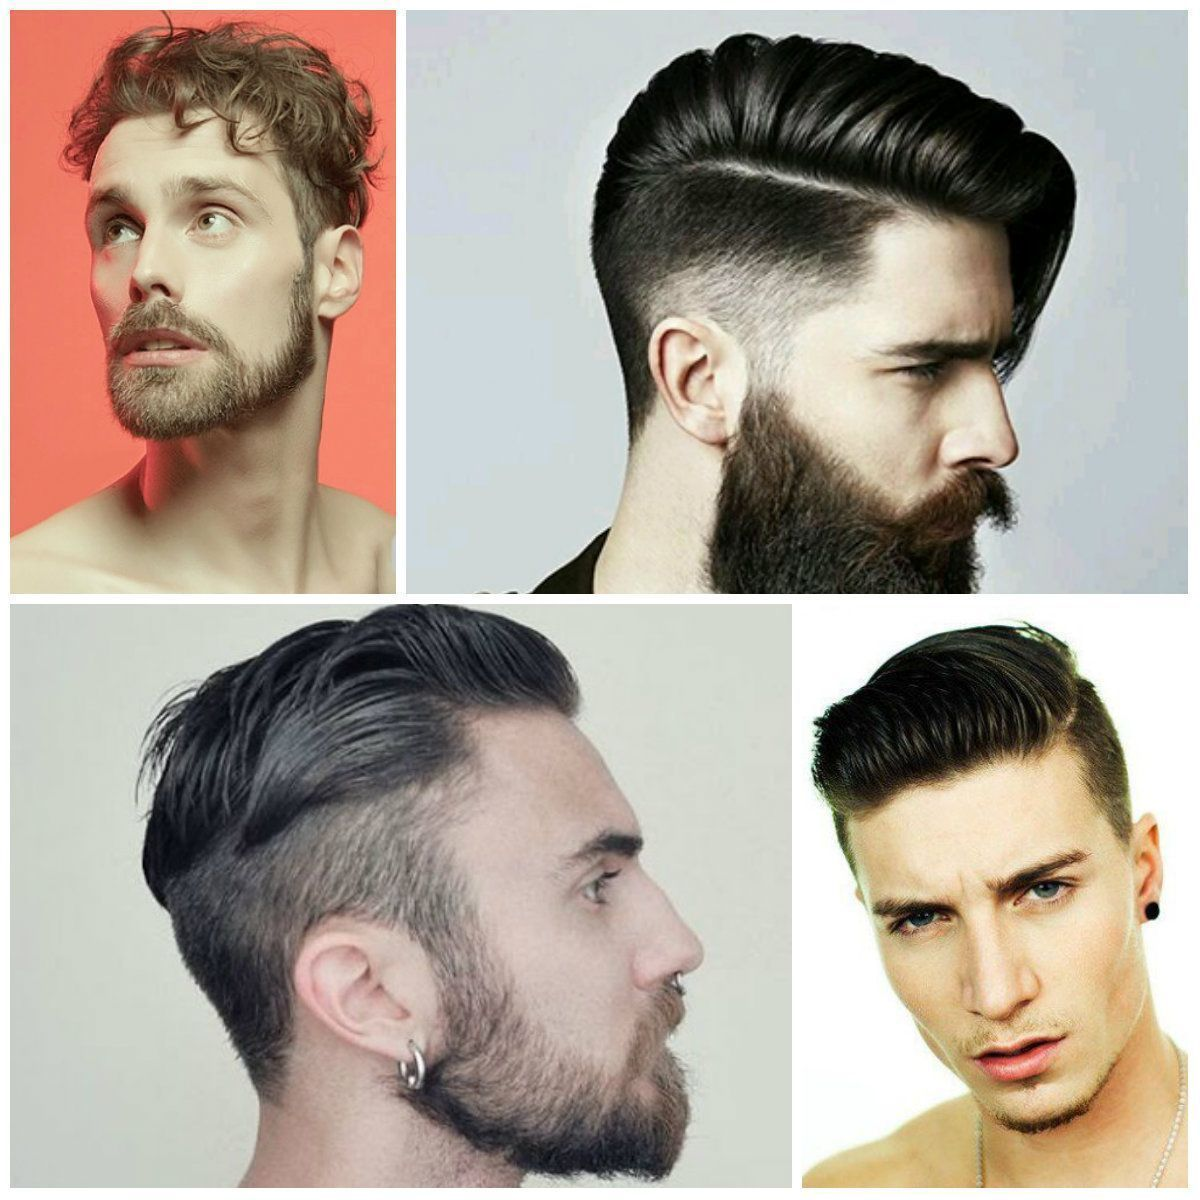 Cool undercut hairstyles for men medium newhairideas men